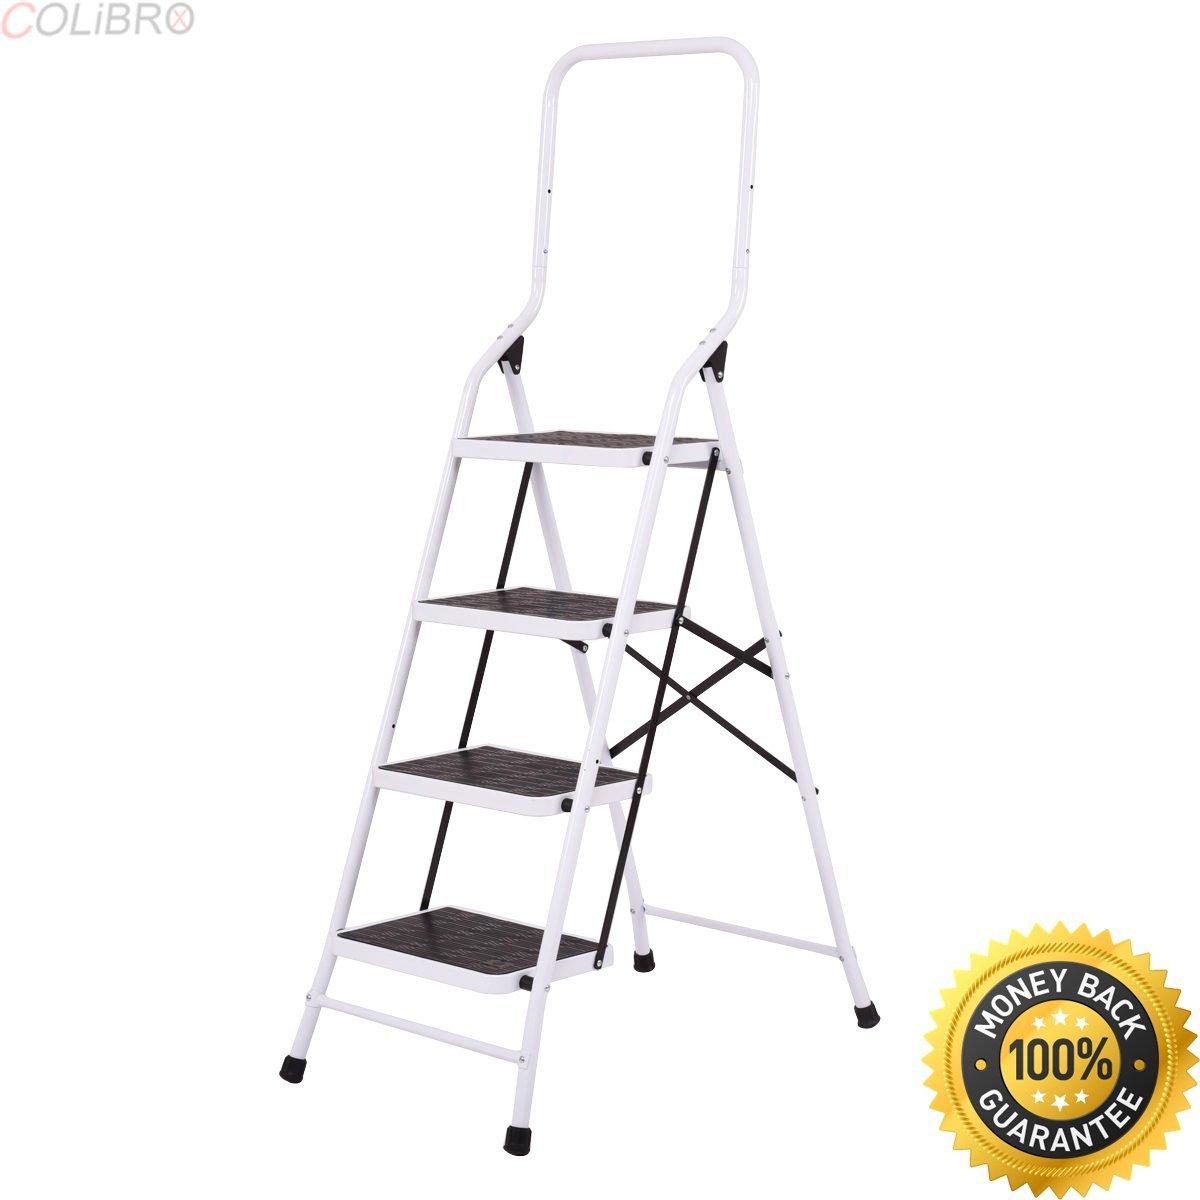 Enjoyable Cheap Aluminum Step Stool Platform Find Aluminum Step Stool Machost Co Dining Chair Design Ideas Machostcouk